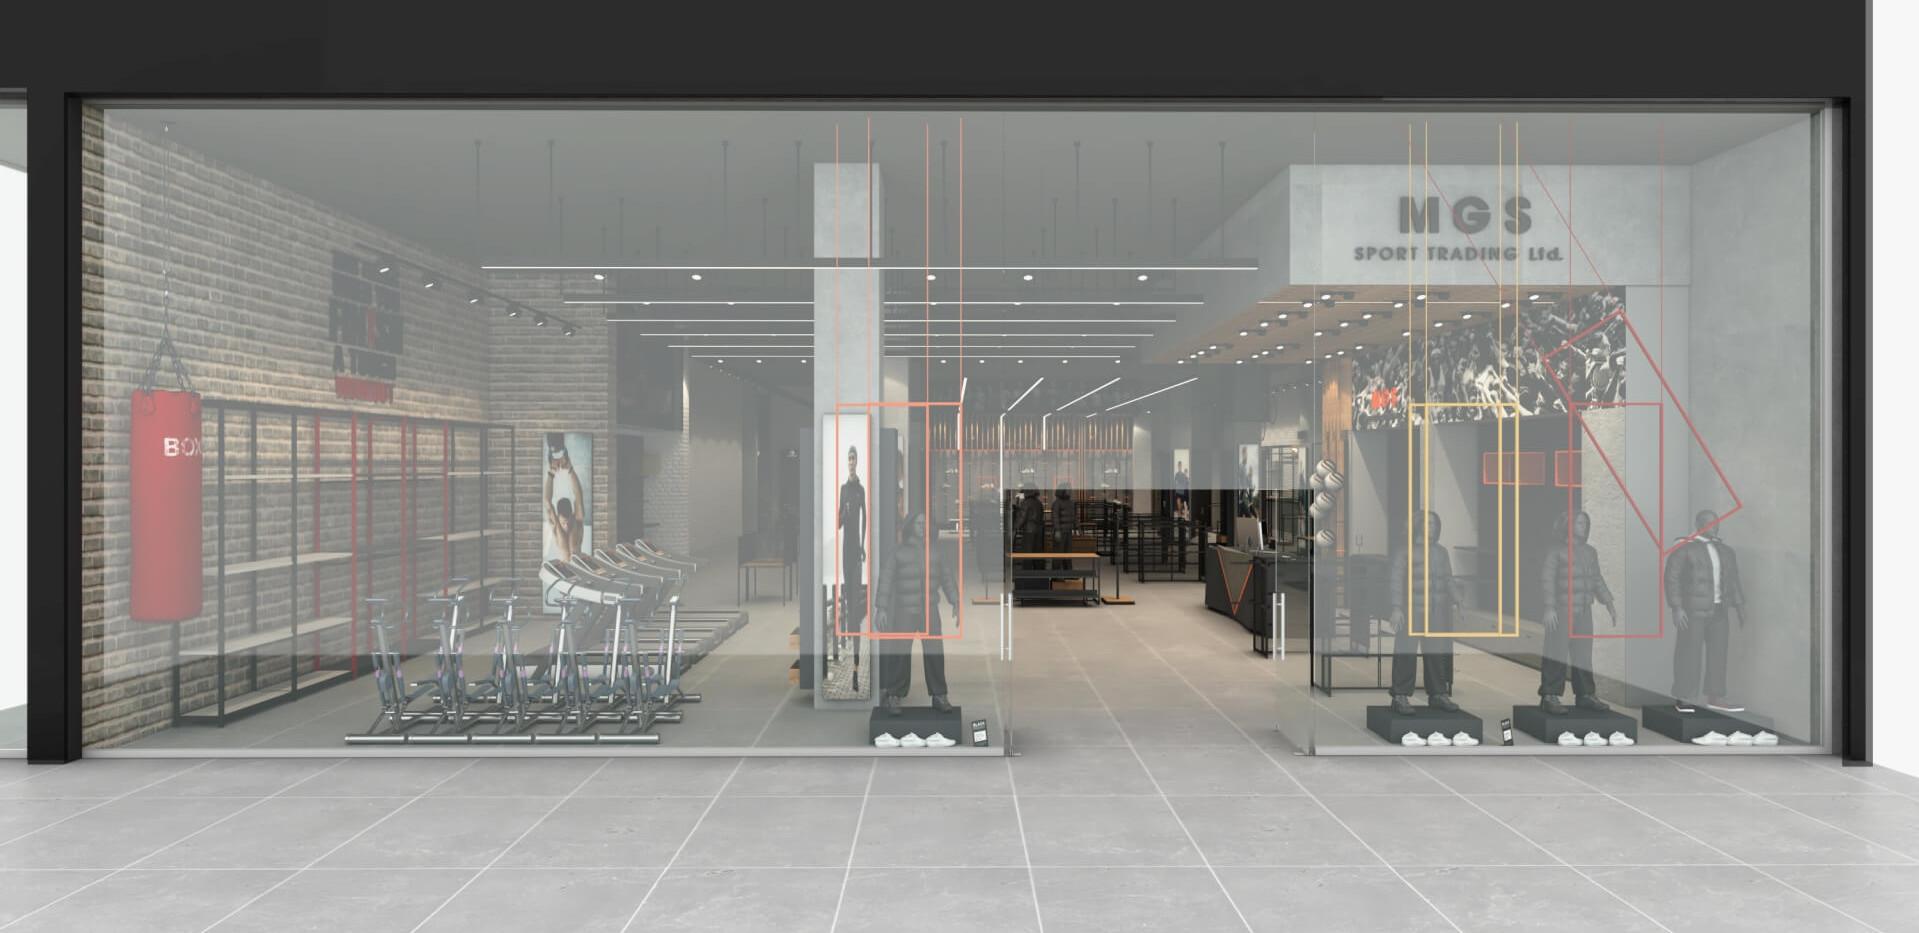 MGS Sport - Sports Store Shop Design-8.j